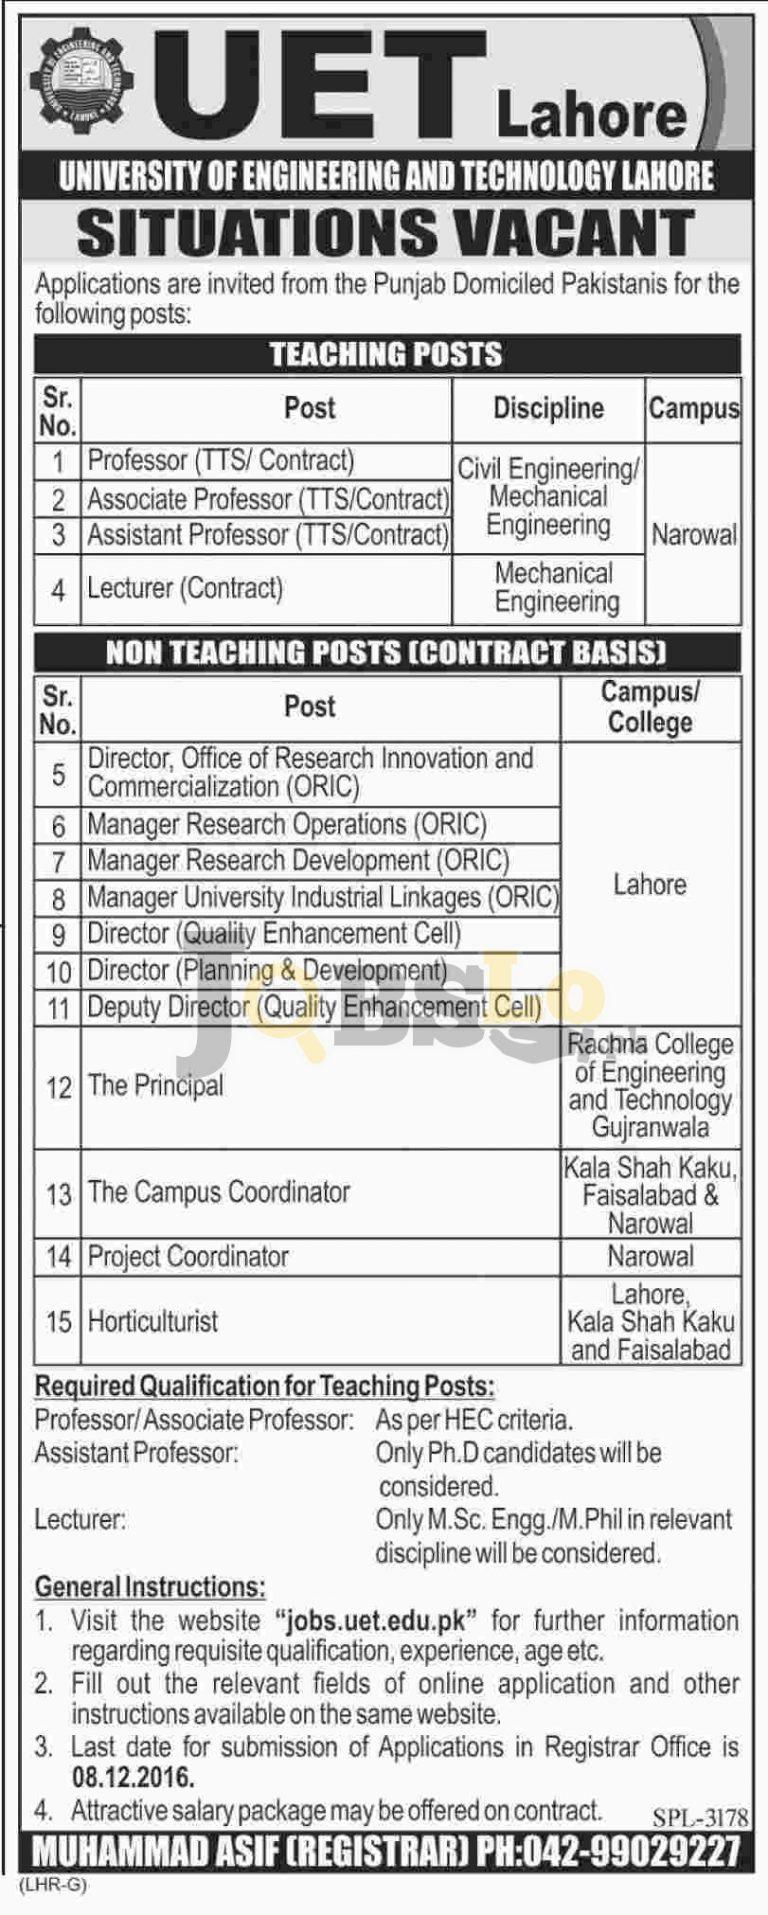 UET Lahore Jobs 2016 University of Engineering & Technology Online Form uet.edu.pk